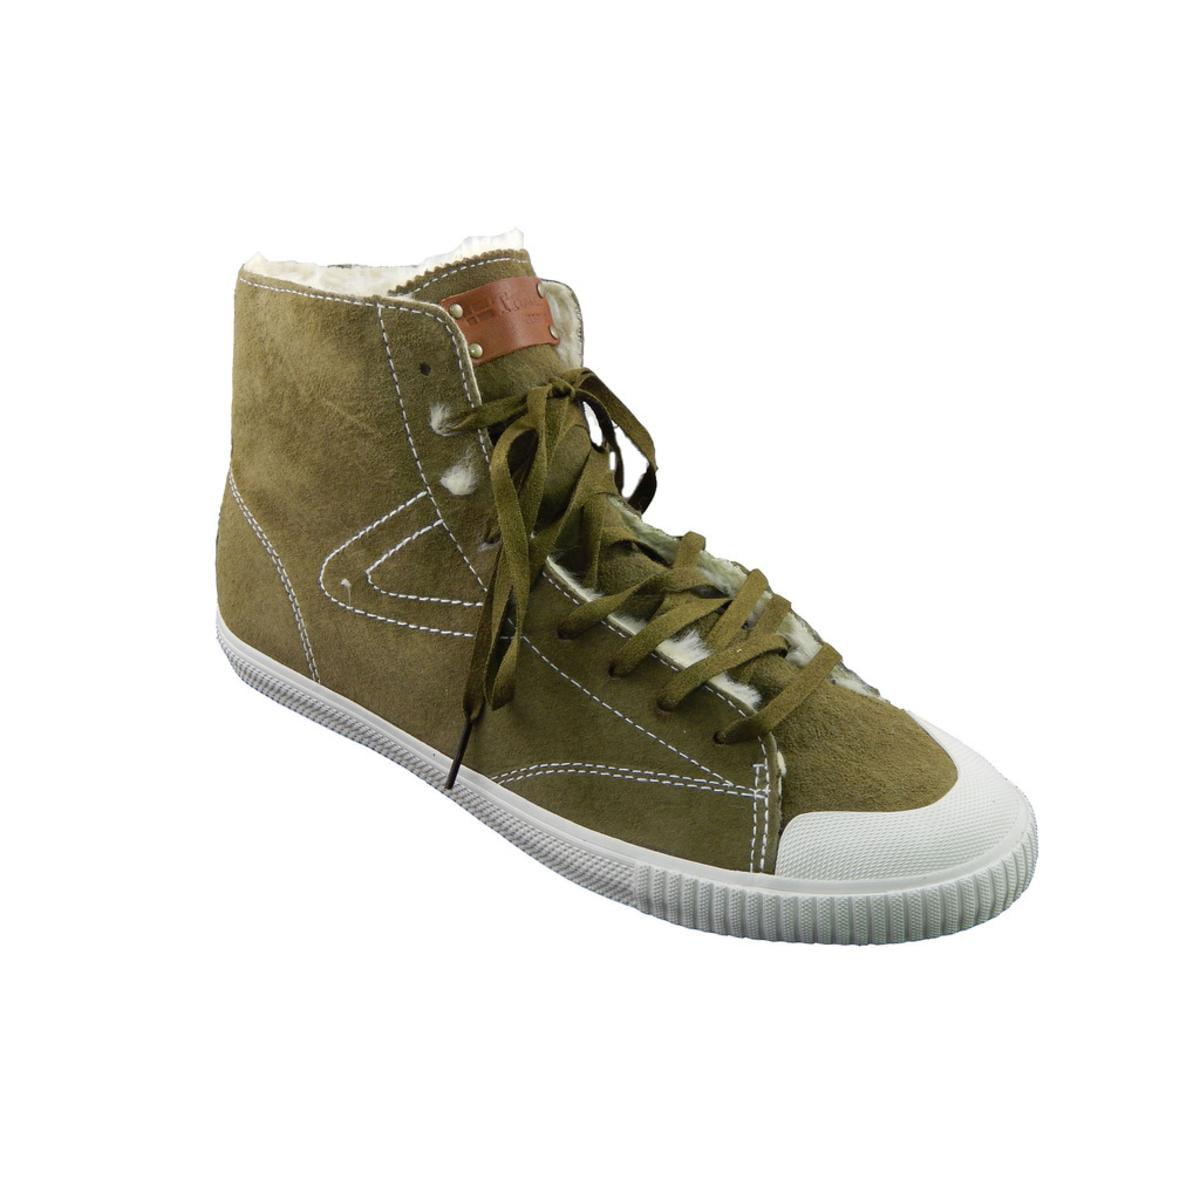 Tretorn Sofie Mid Vinter Womens Dark Olive Brow Sneakers by Tretorn